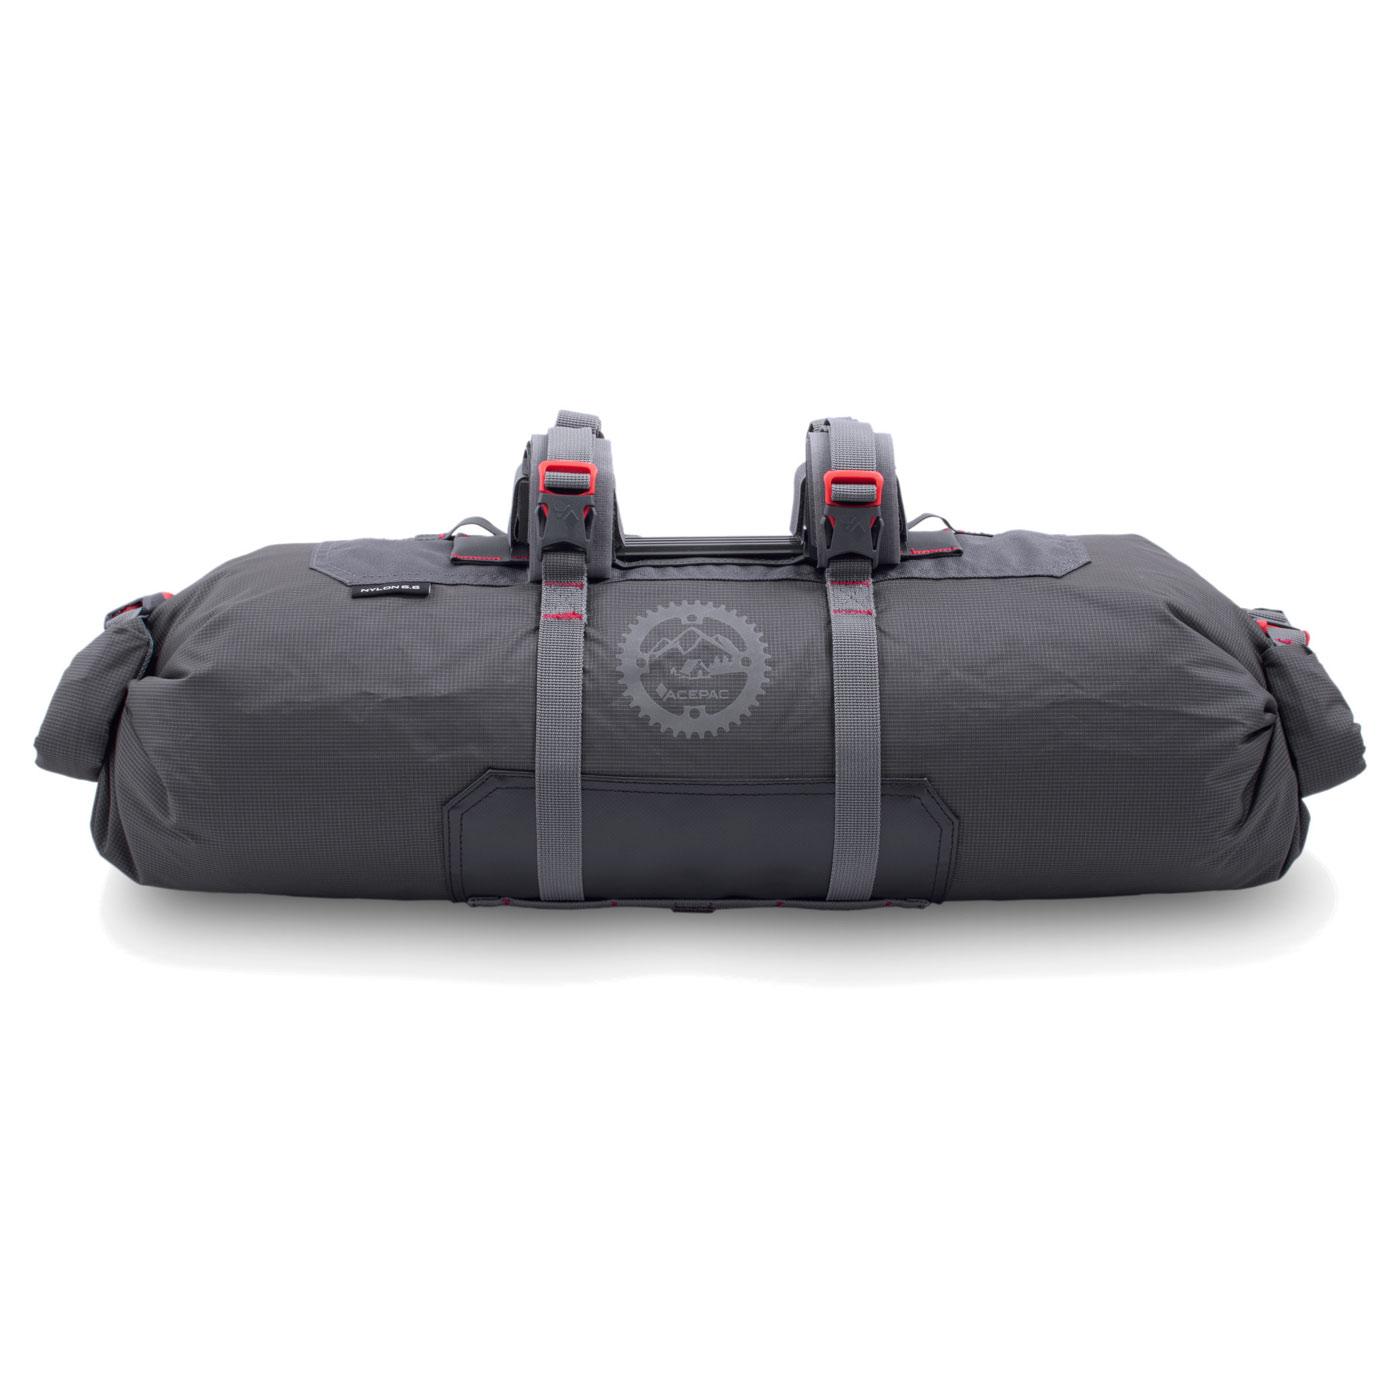 Acepac Bar Roll Handlebar Bag - grey